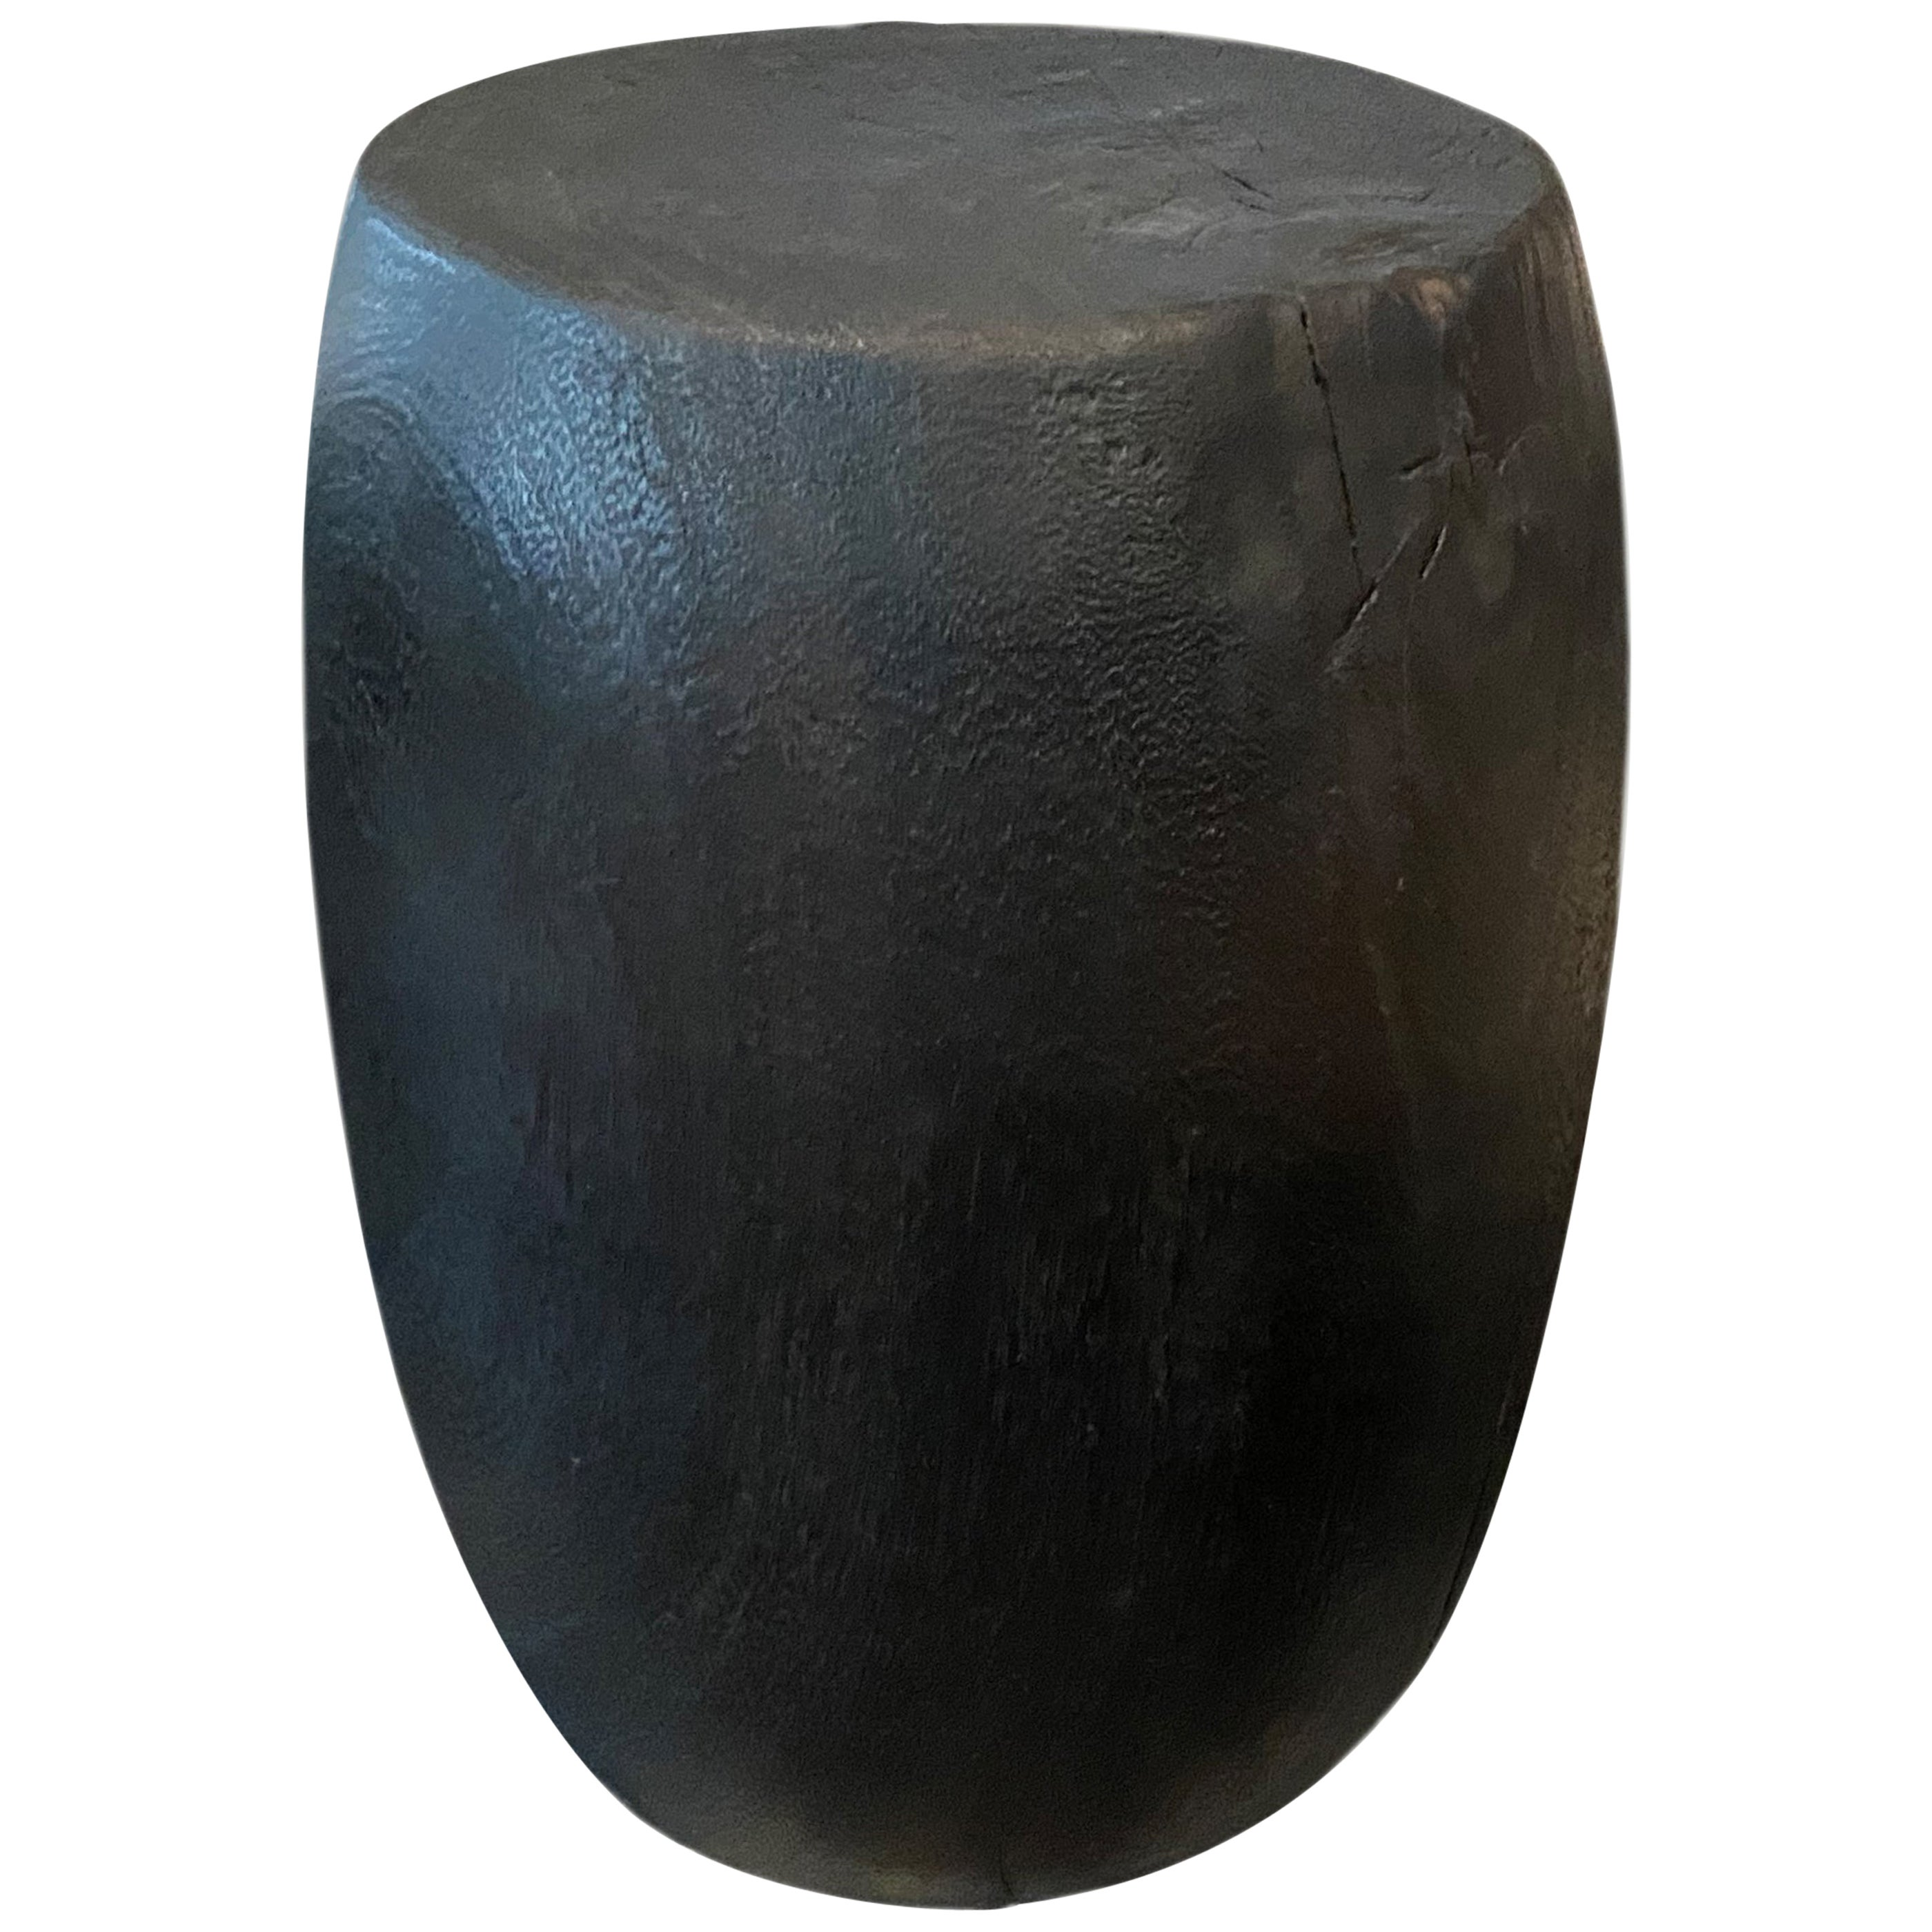 Andrianna Shamaris Charred Drum Style Teak Side Table or Stool